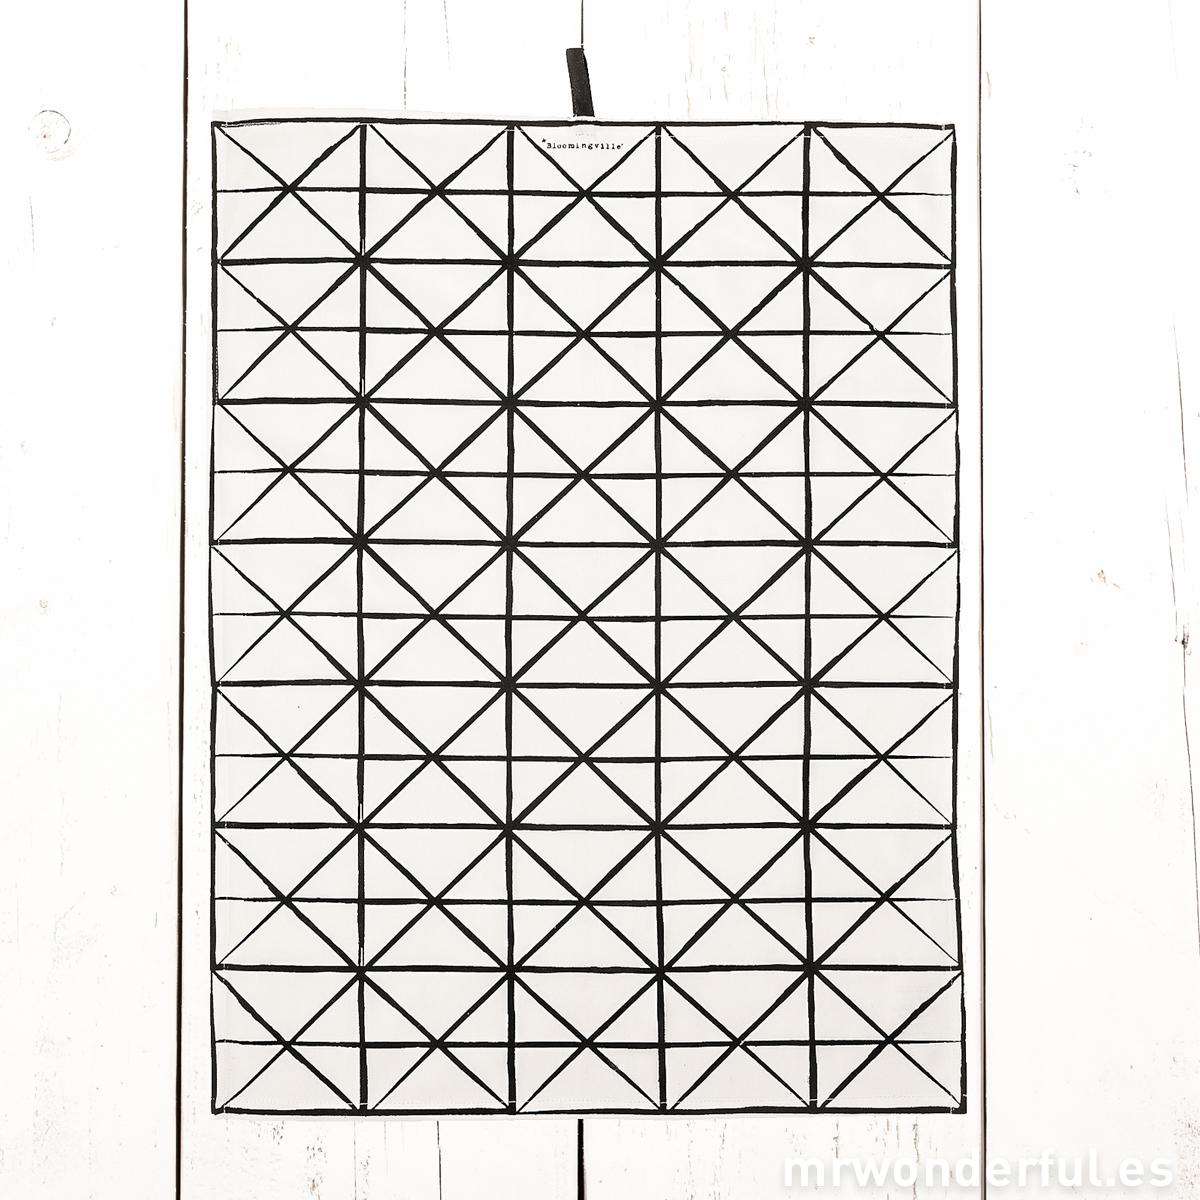 mrwonderful_6200022_2_trapo-cocina_estampado-geometrico-pequeño-1